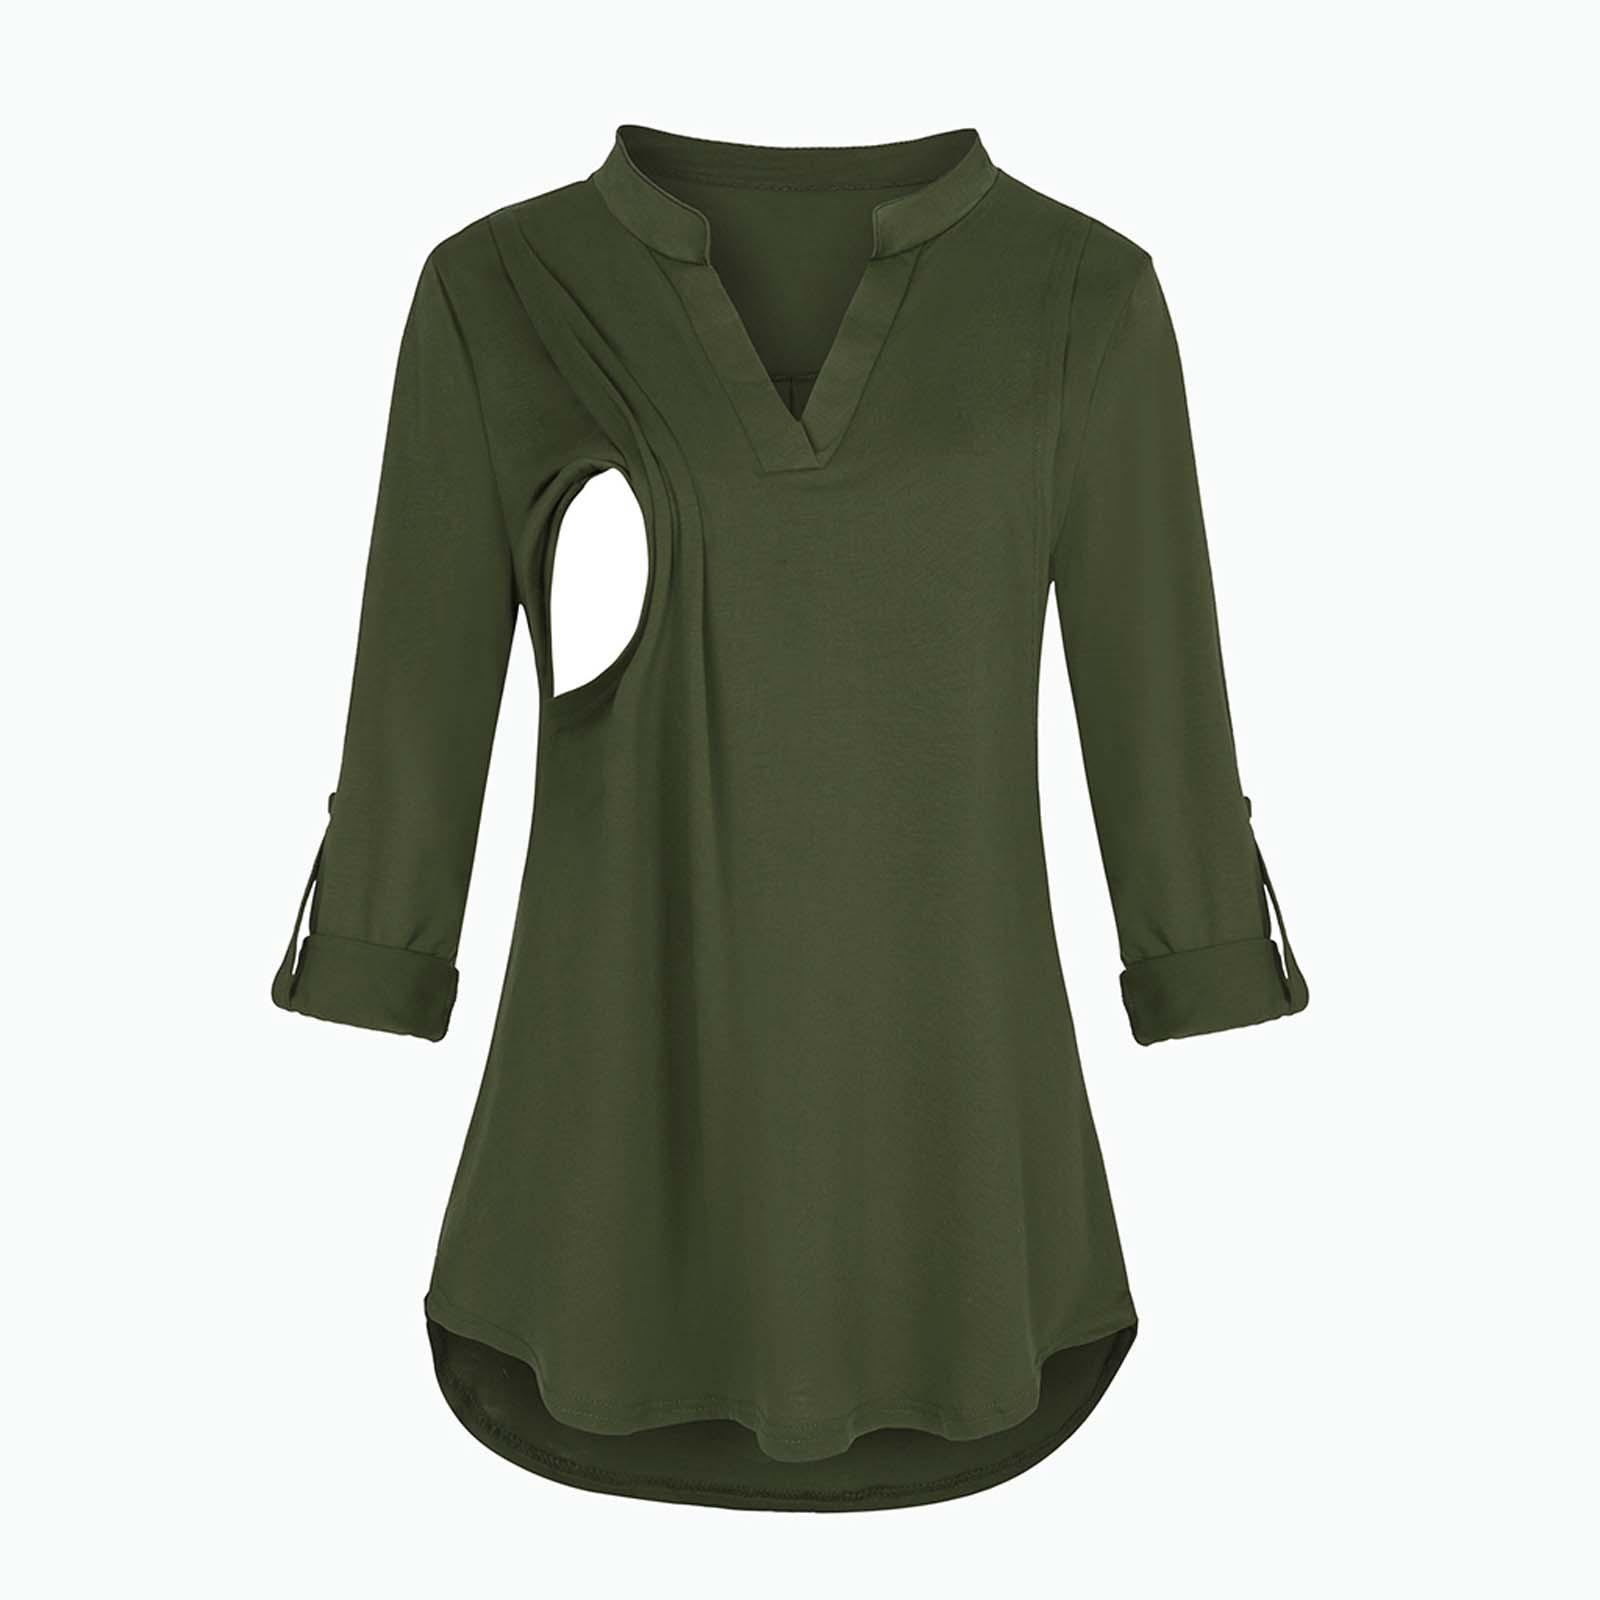 Maternity Fashion Polyester T-Shirt V-Neck Solid Color Long Sleeve Nursing Wear Nursing Maternity Wear VêTements Grossesse éTé